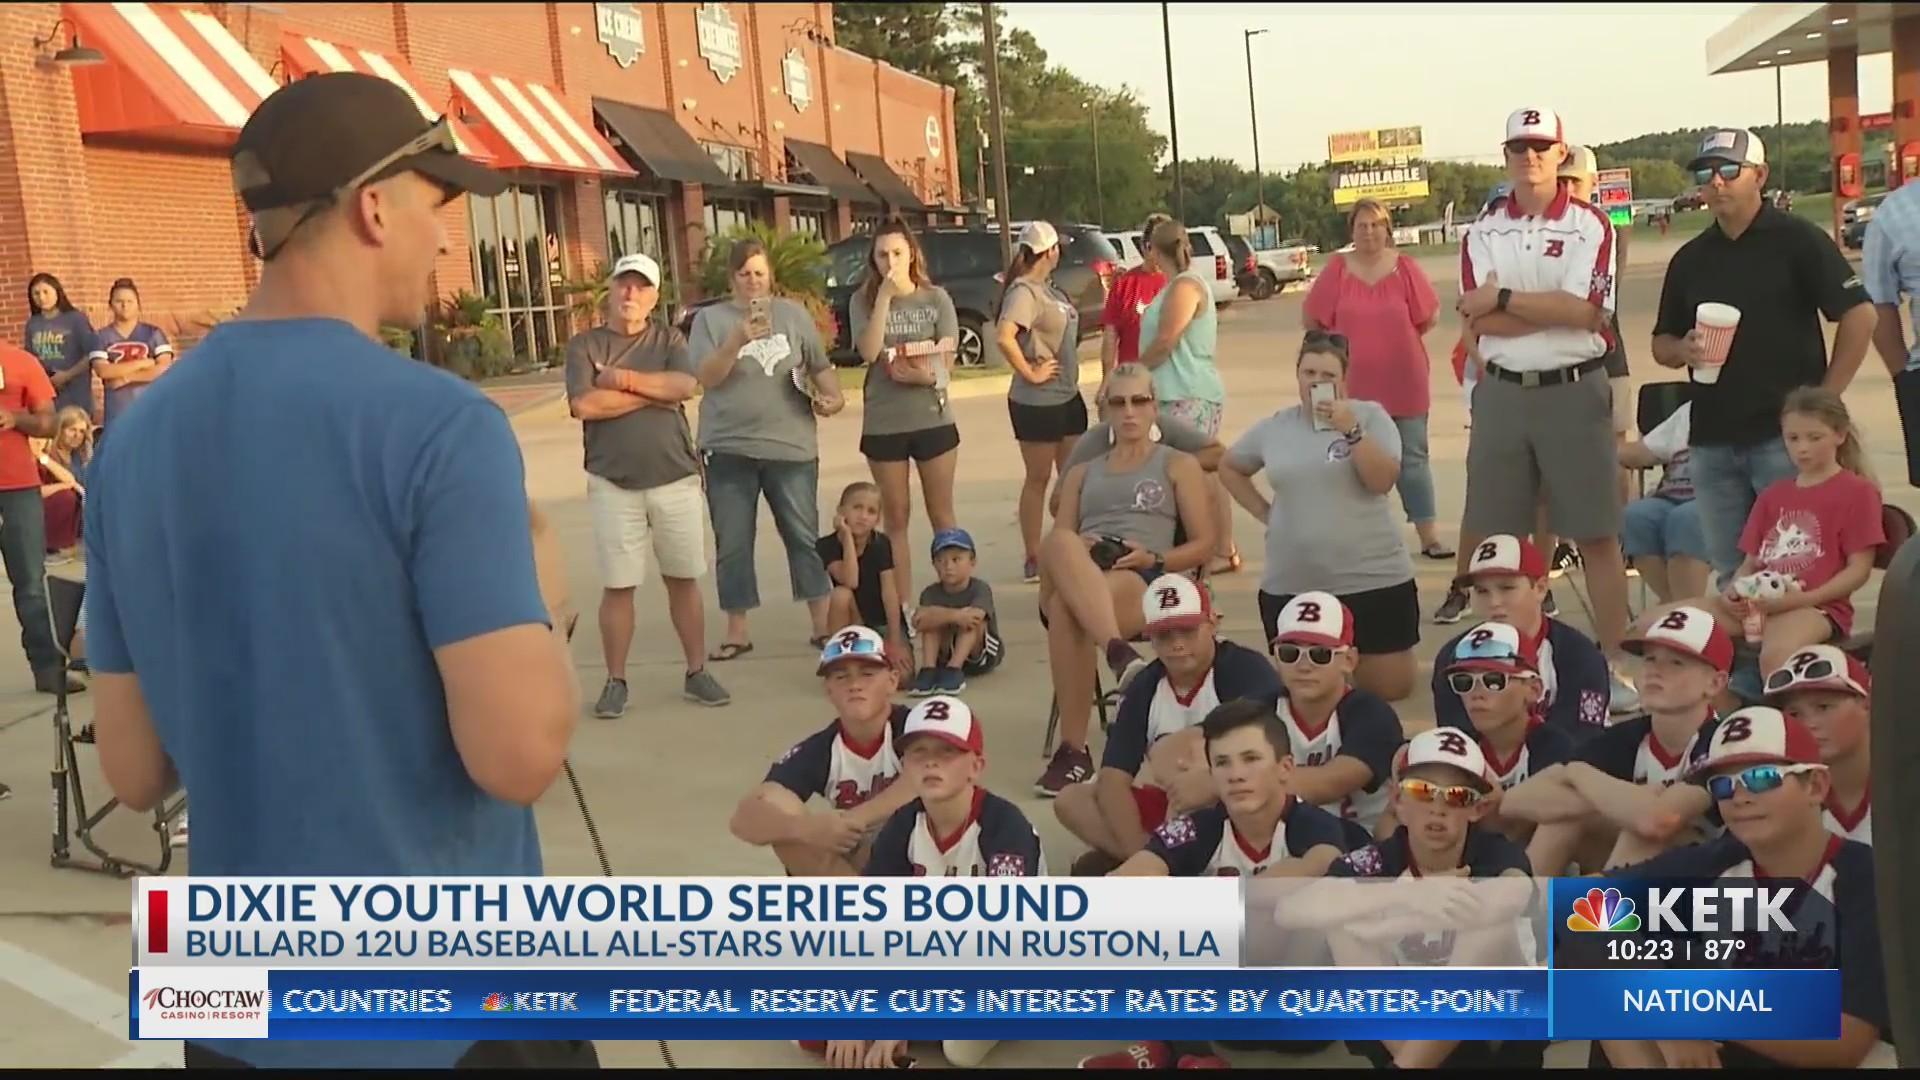 Dixie World Series bound, Bullard 12U All-Stars sent off in style